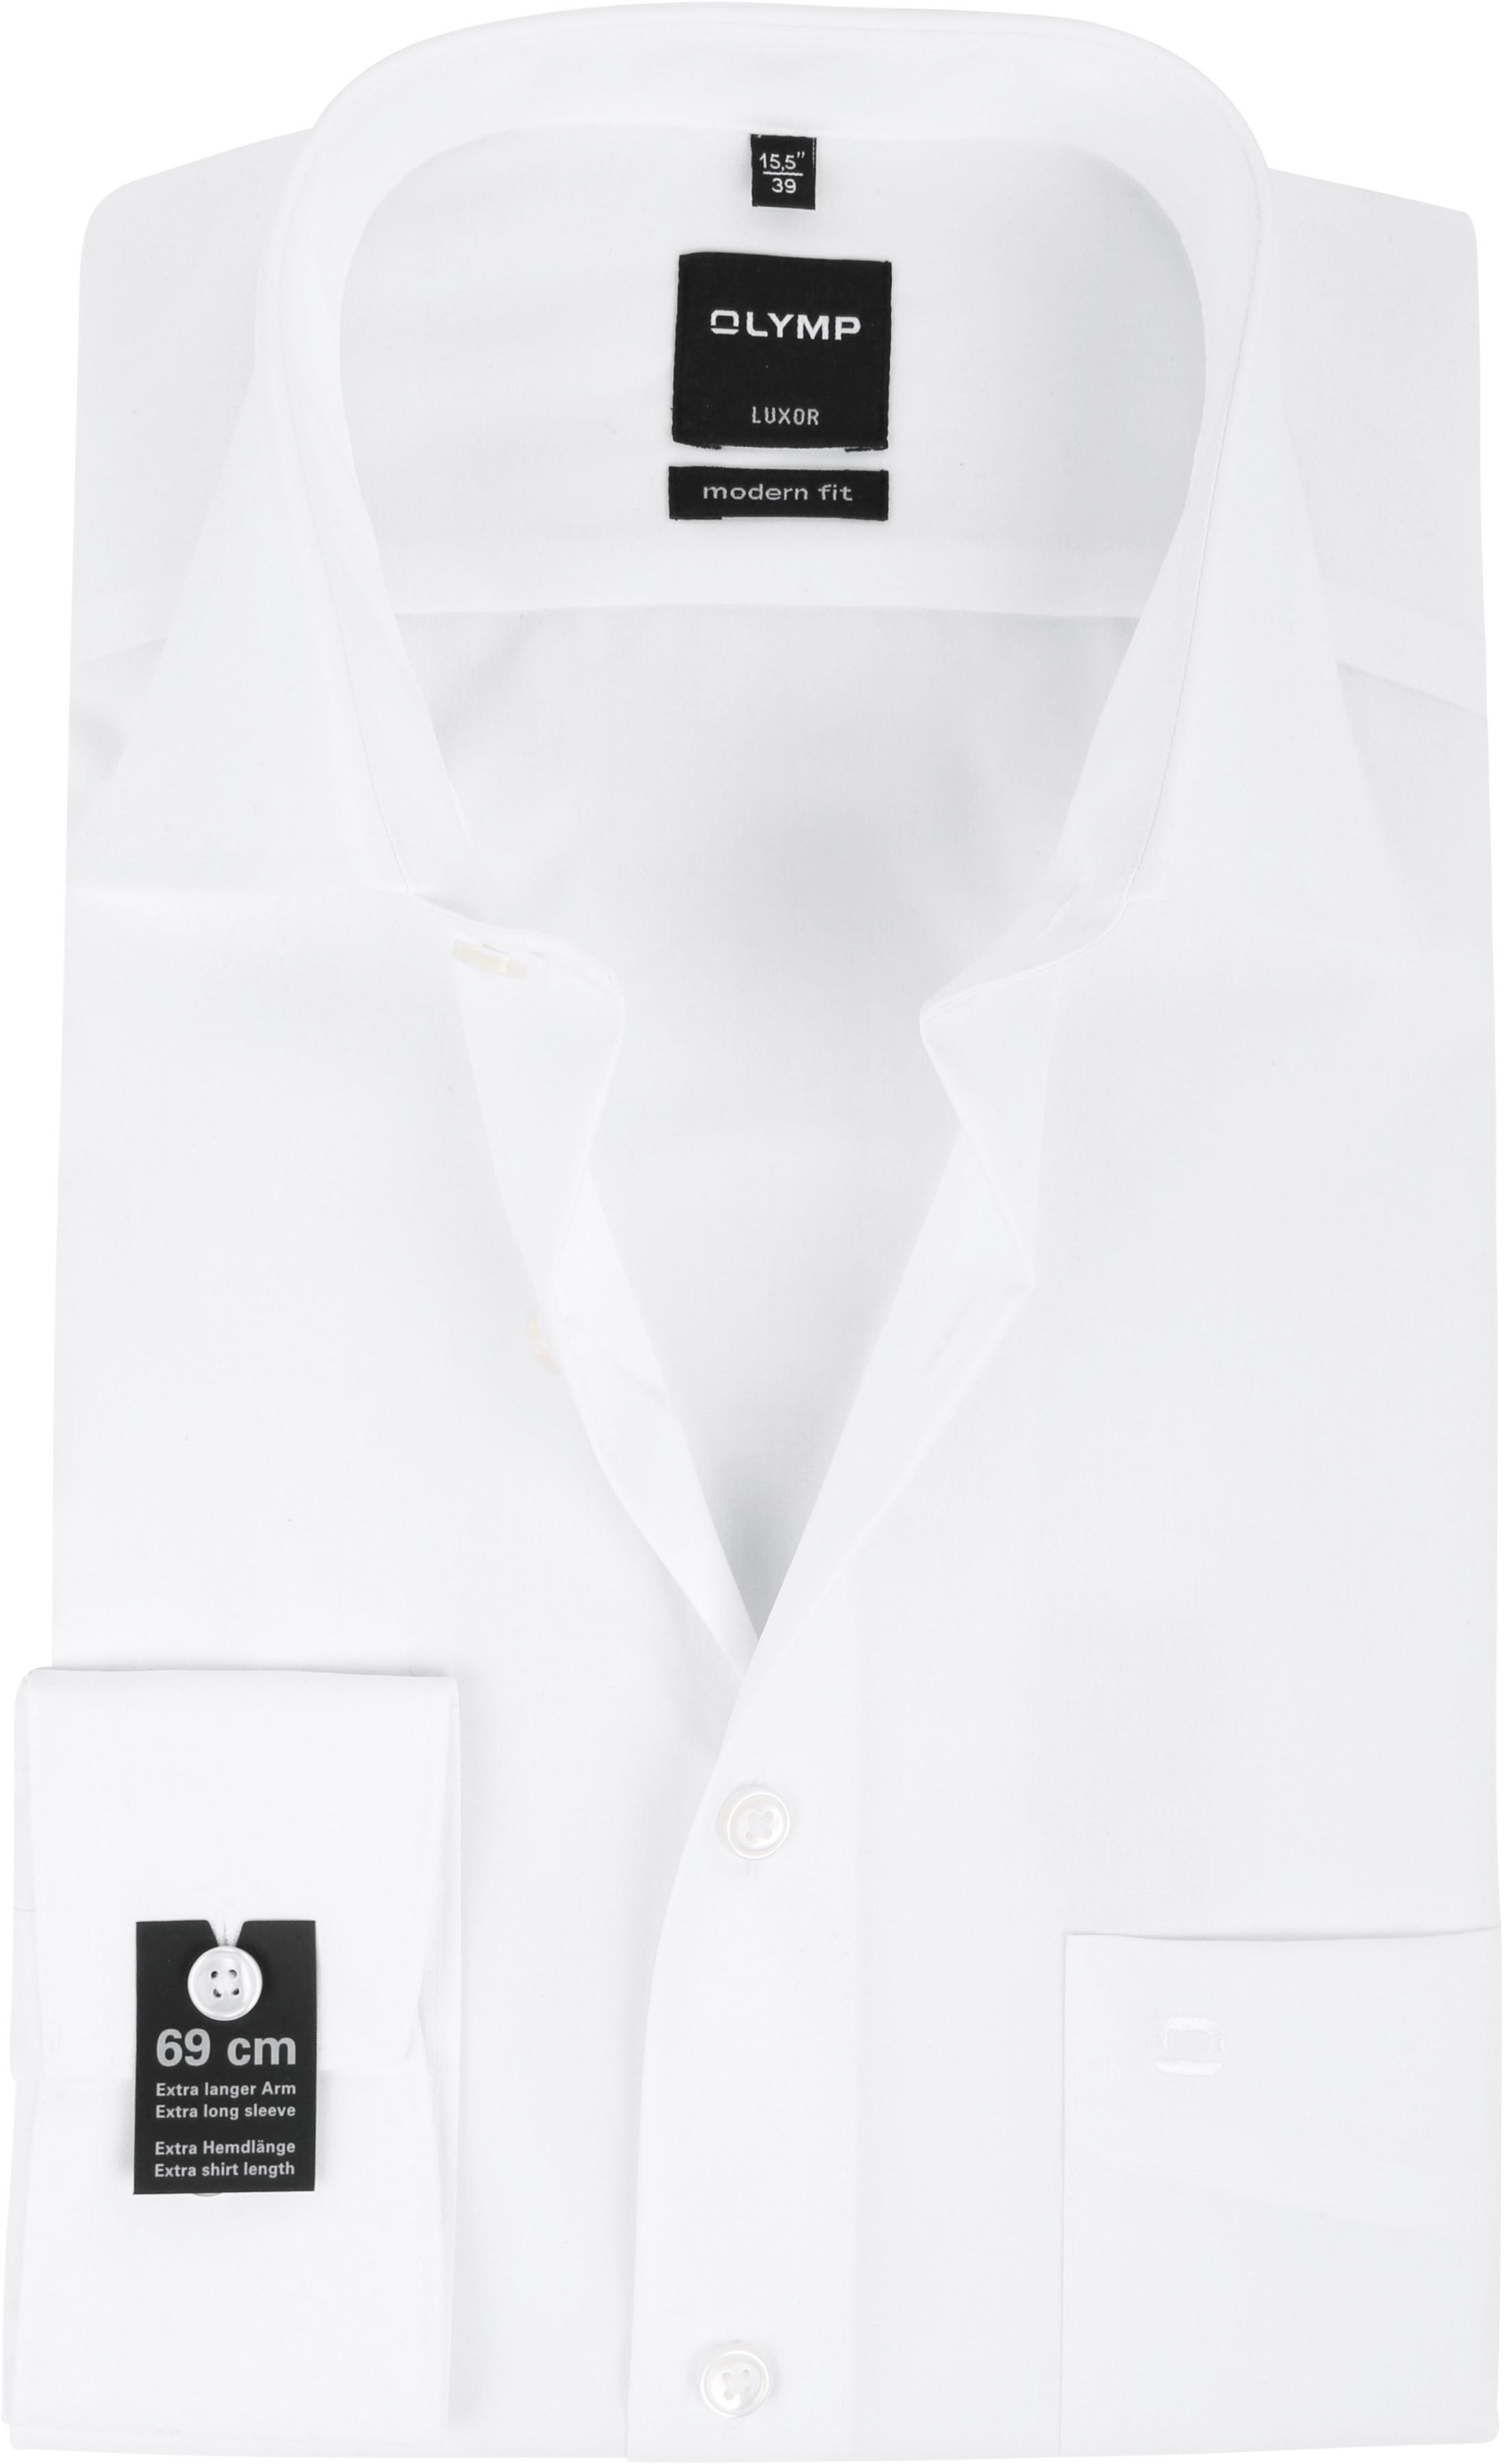 OLYMP Luxor SL7 Overhemd Modern Fit Wit foto 0